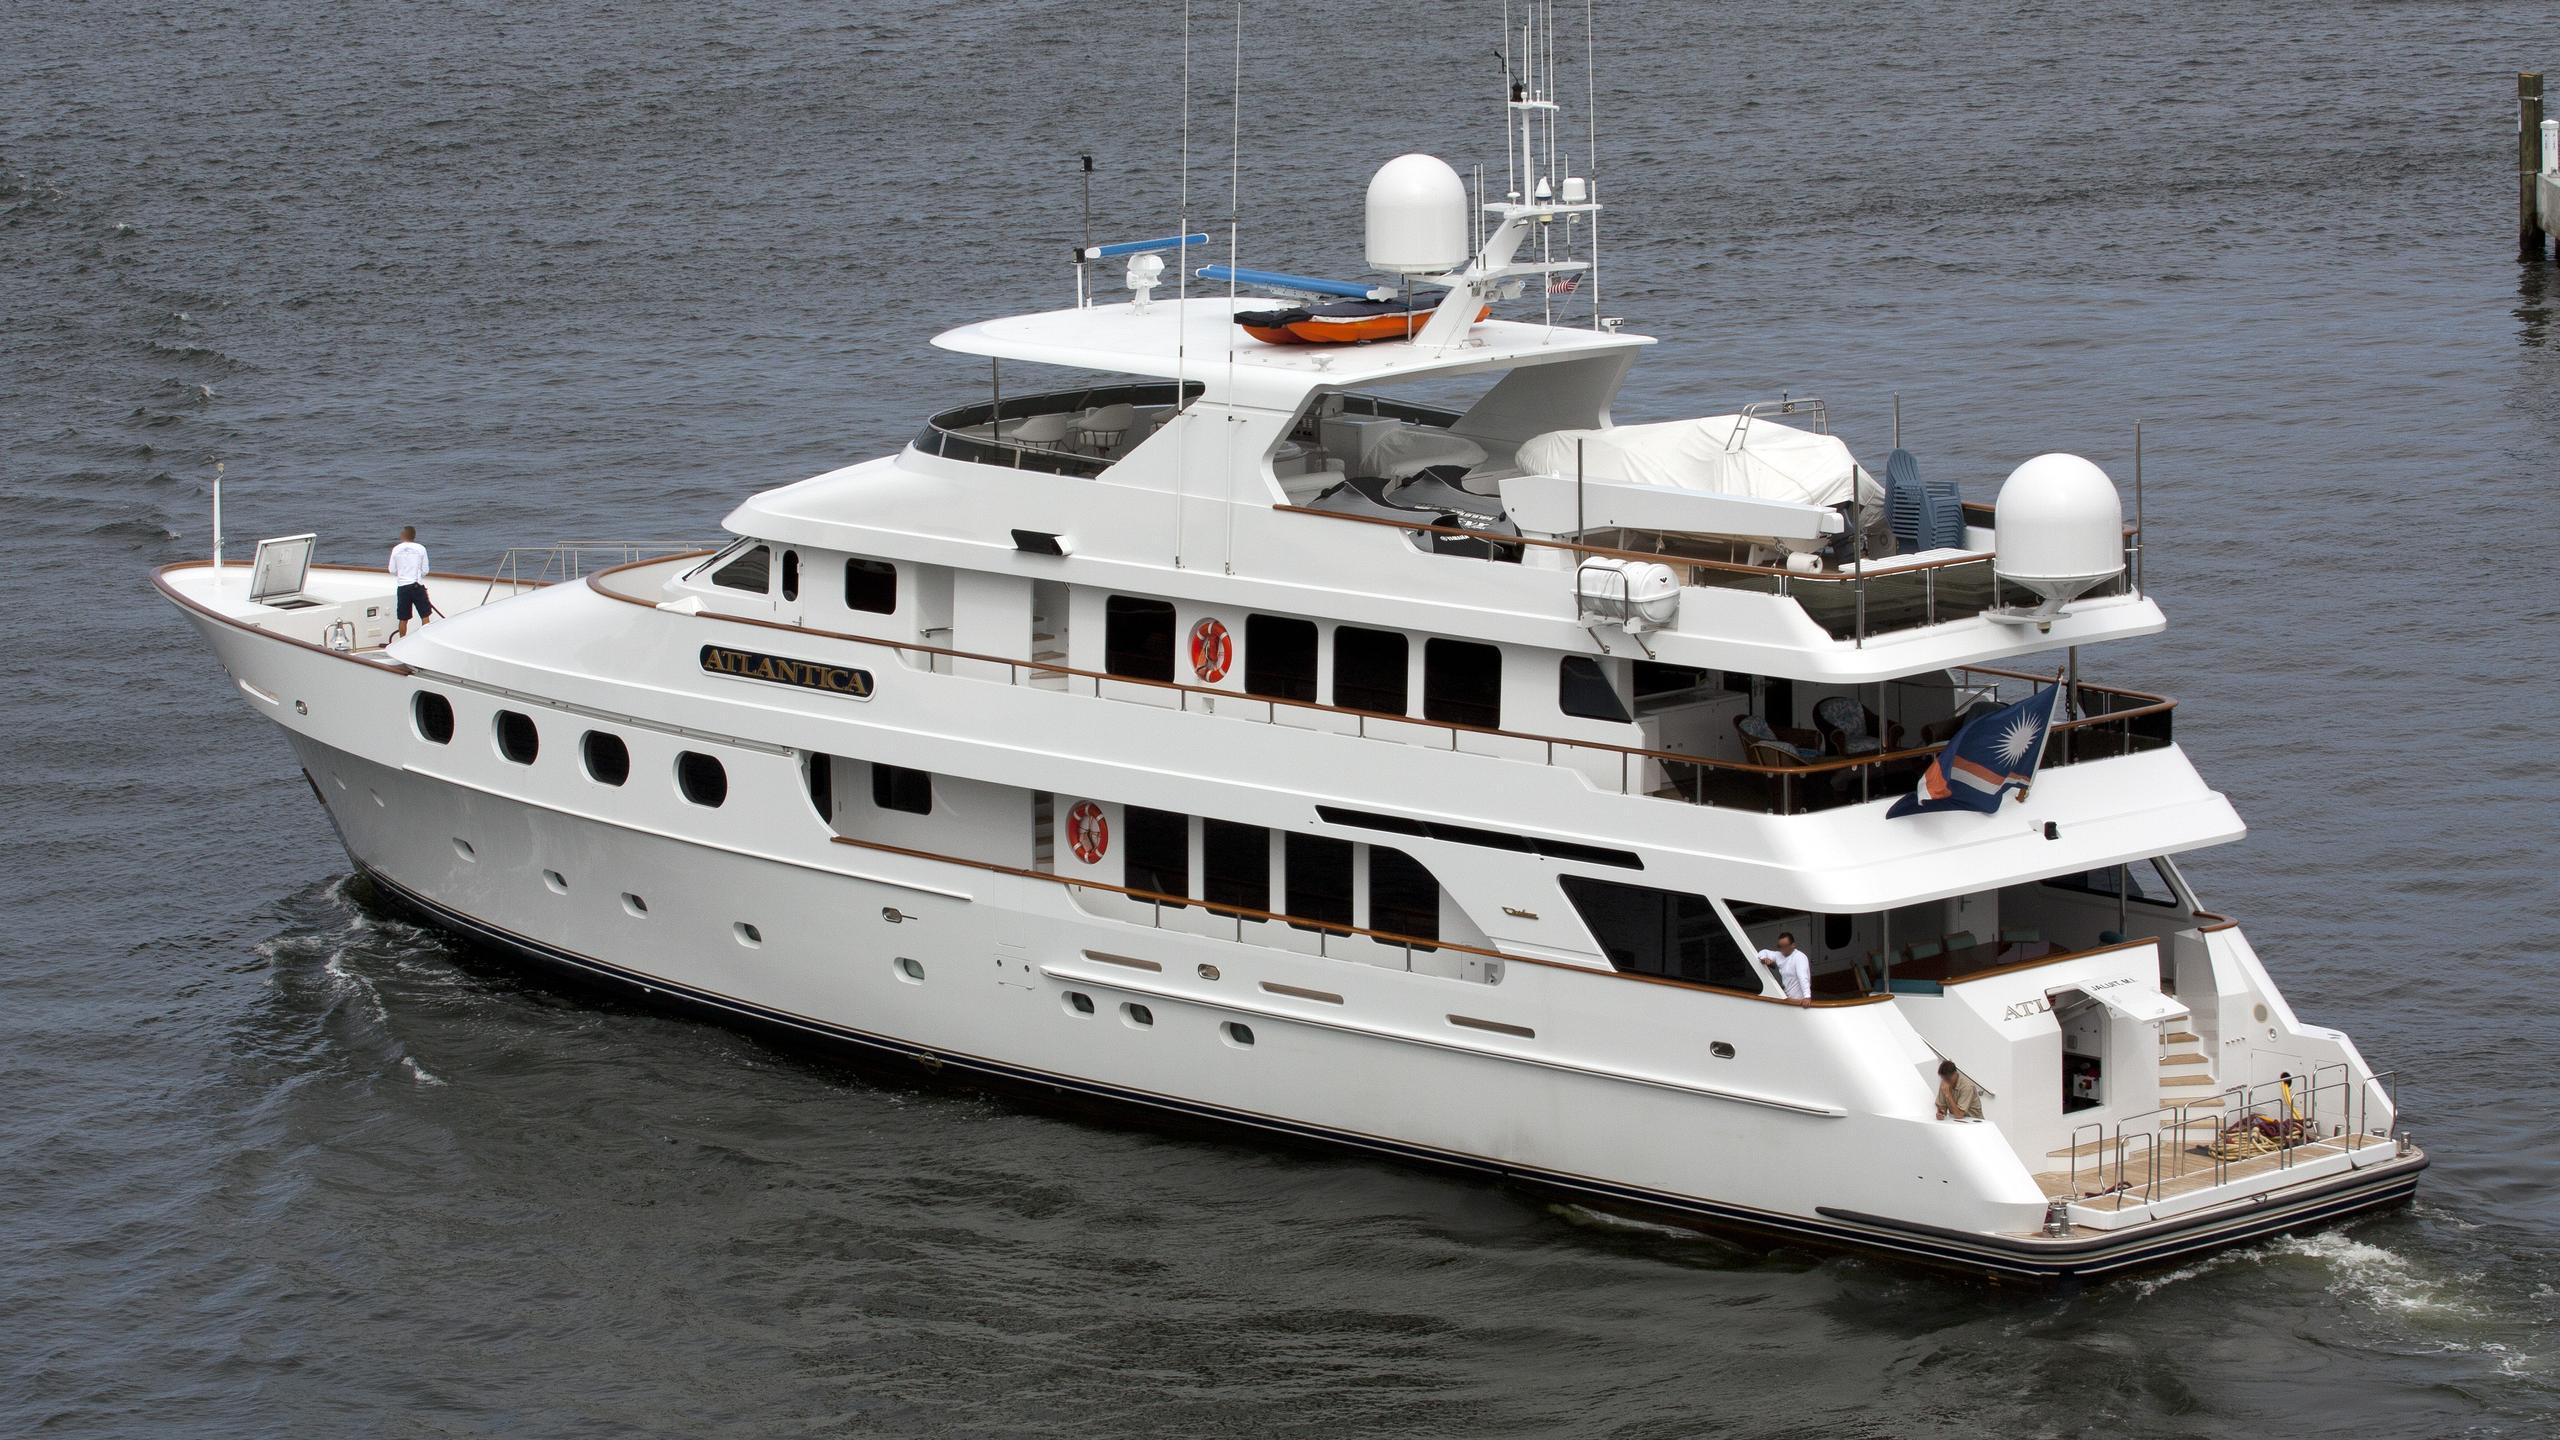 queen d atlantica motoryacht christensen 36m 2000 half stern